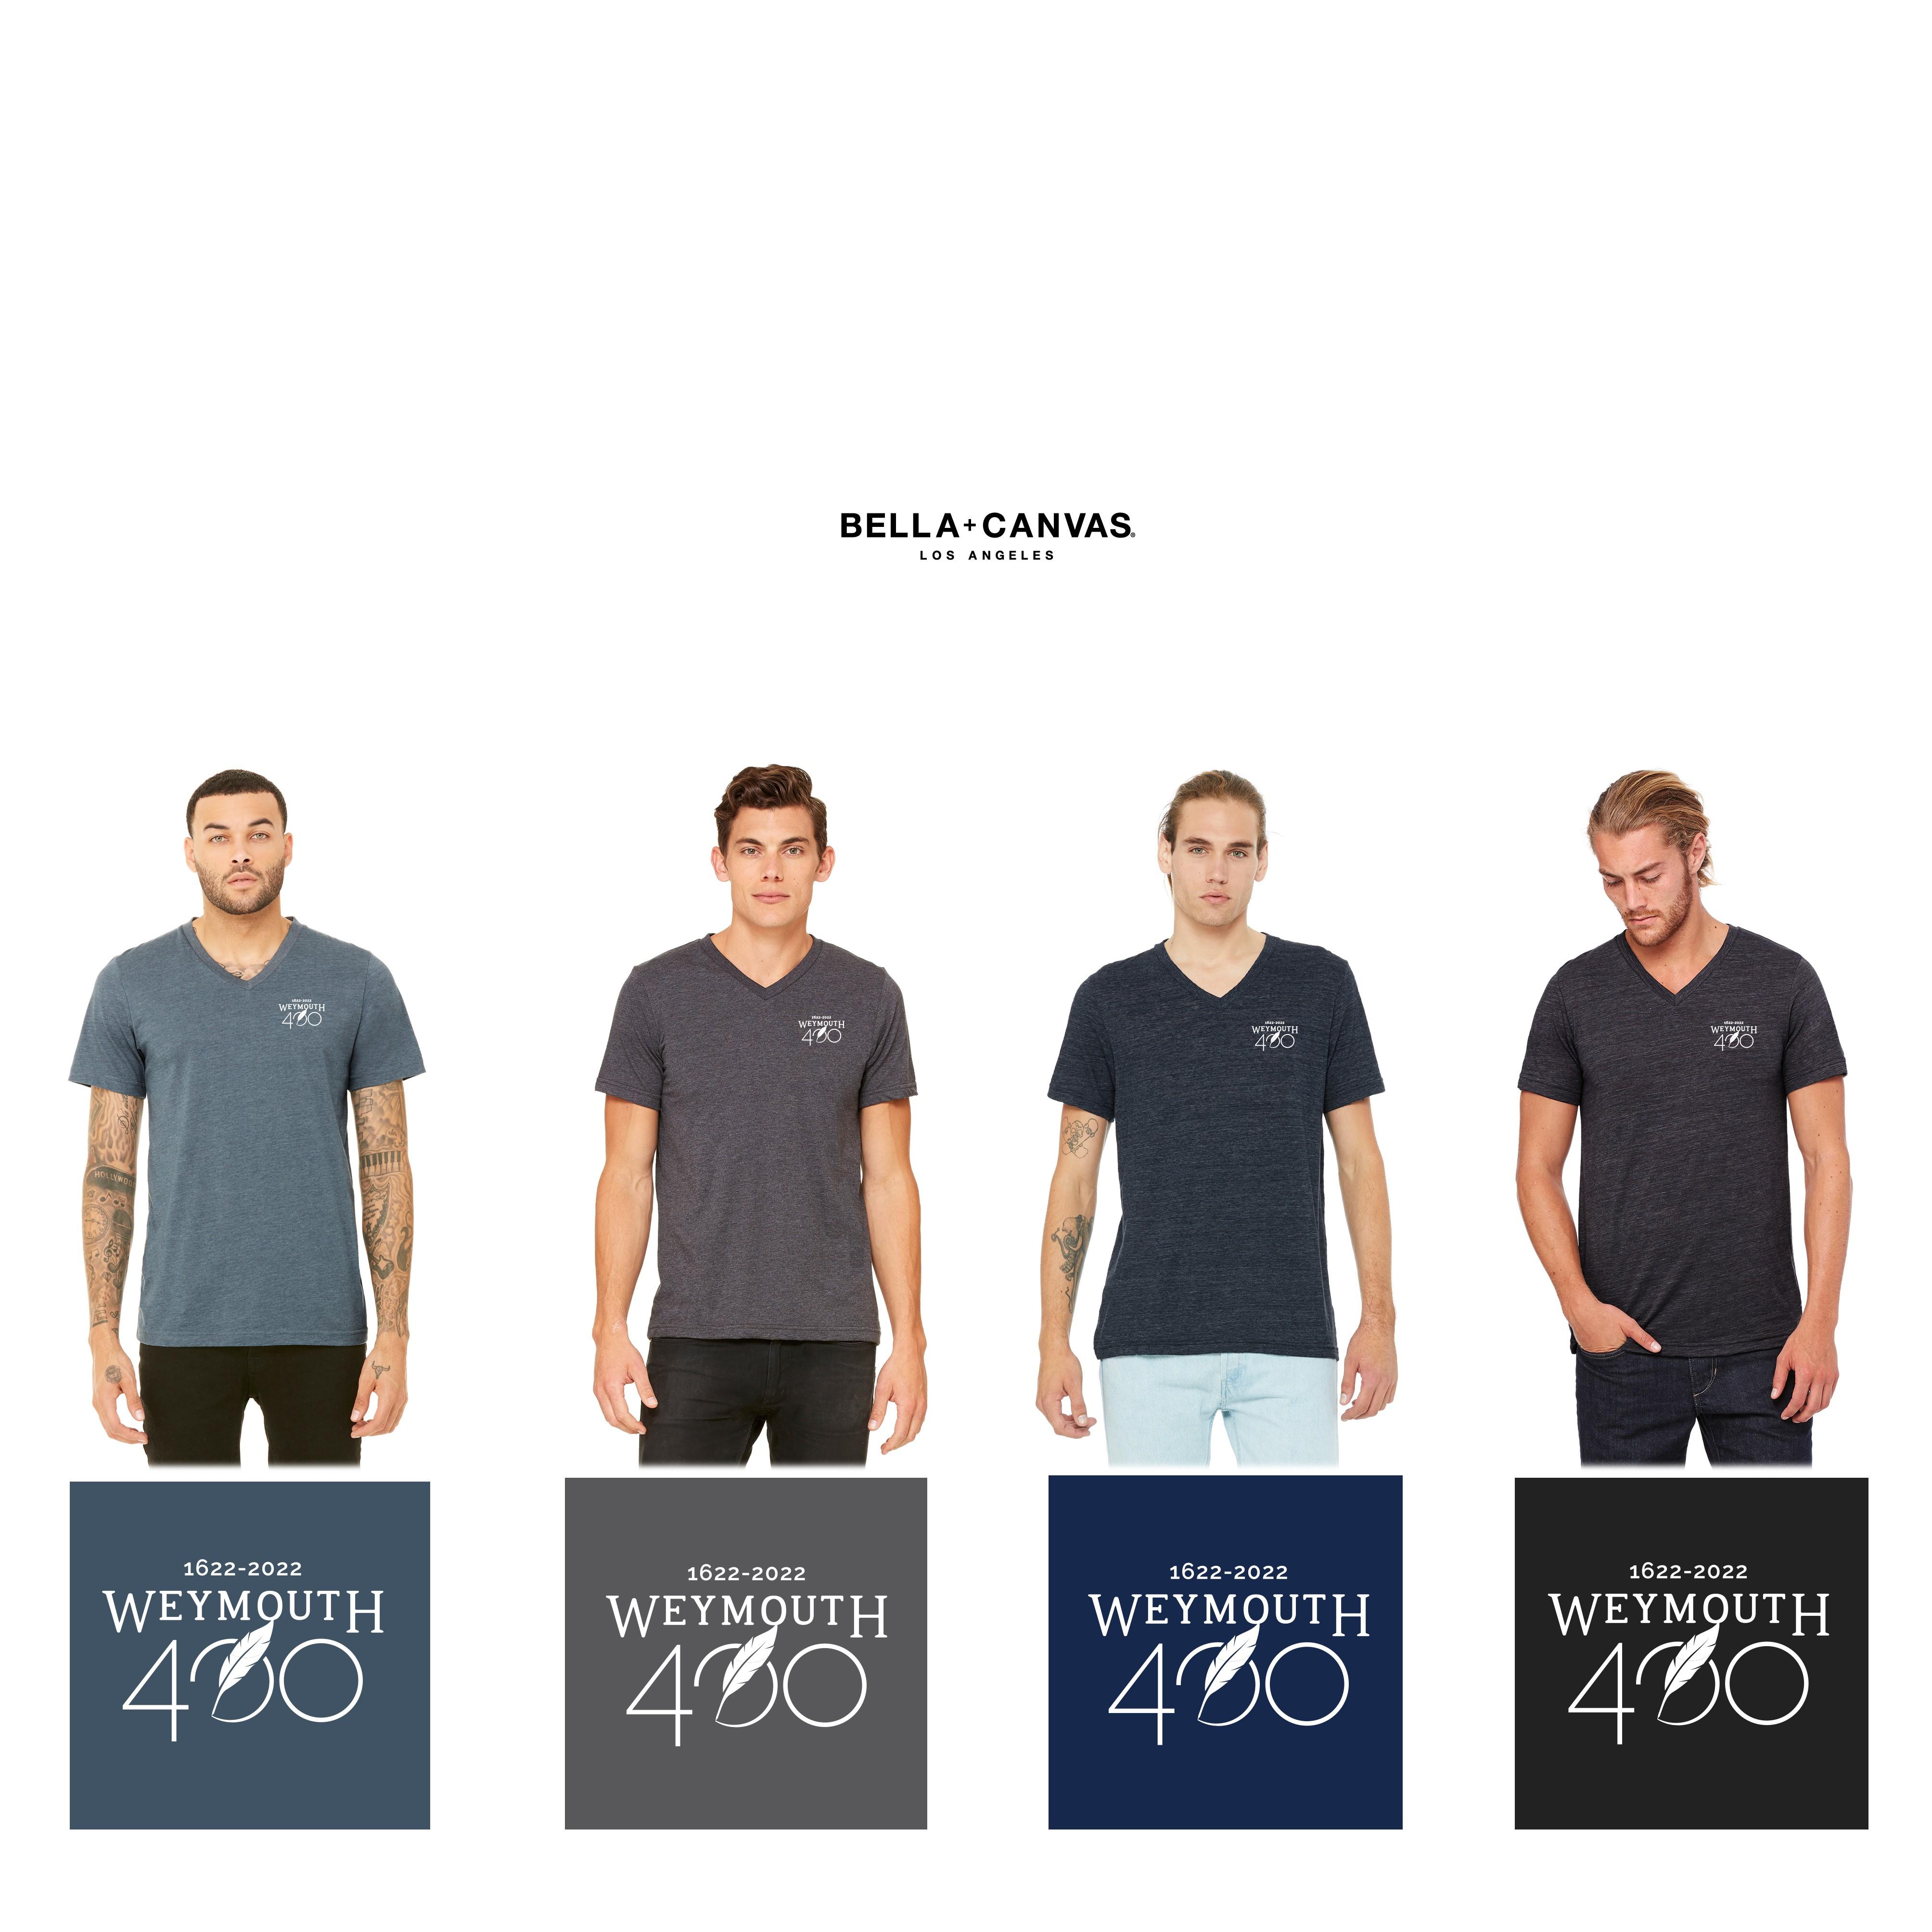 Weymouth 400 Bella + Canvas Mens/Adult Unisex Jersey Short-Sleeve V-Neck T-Shirt